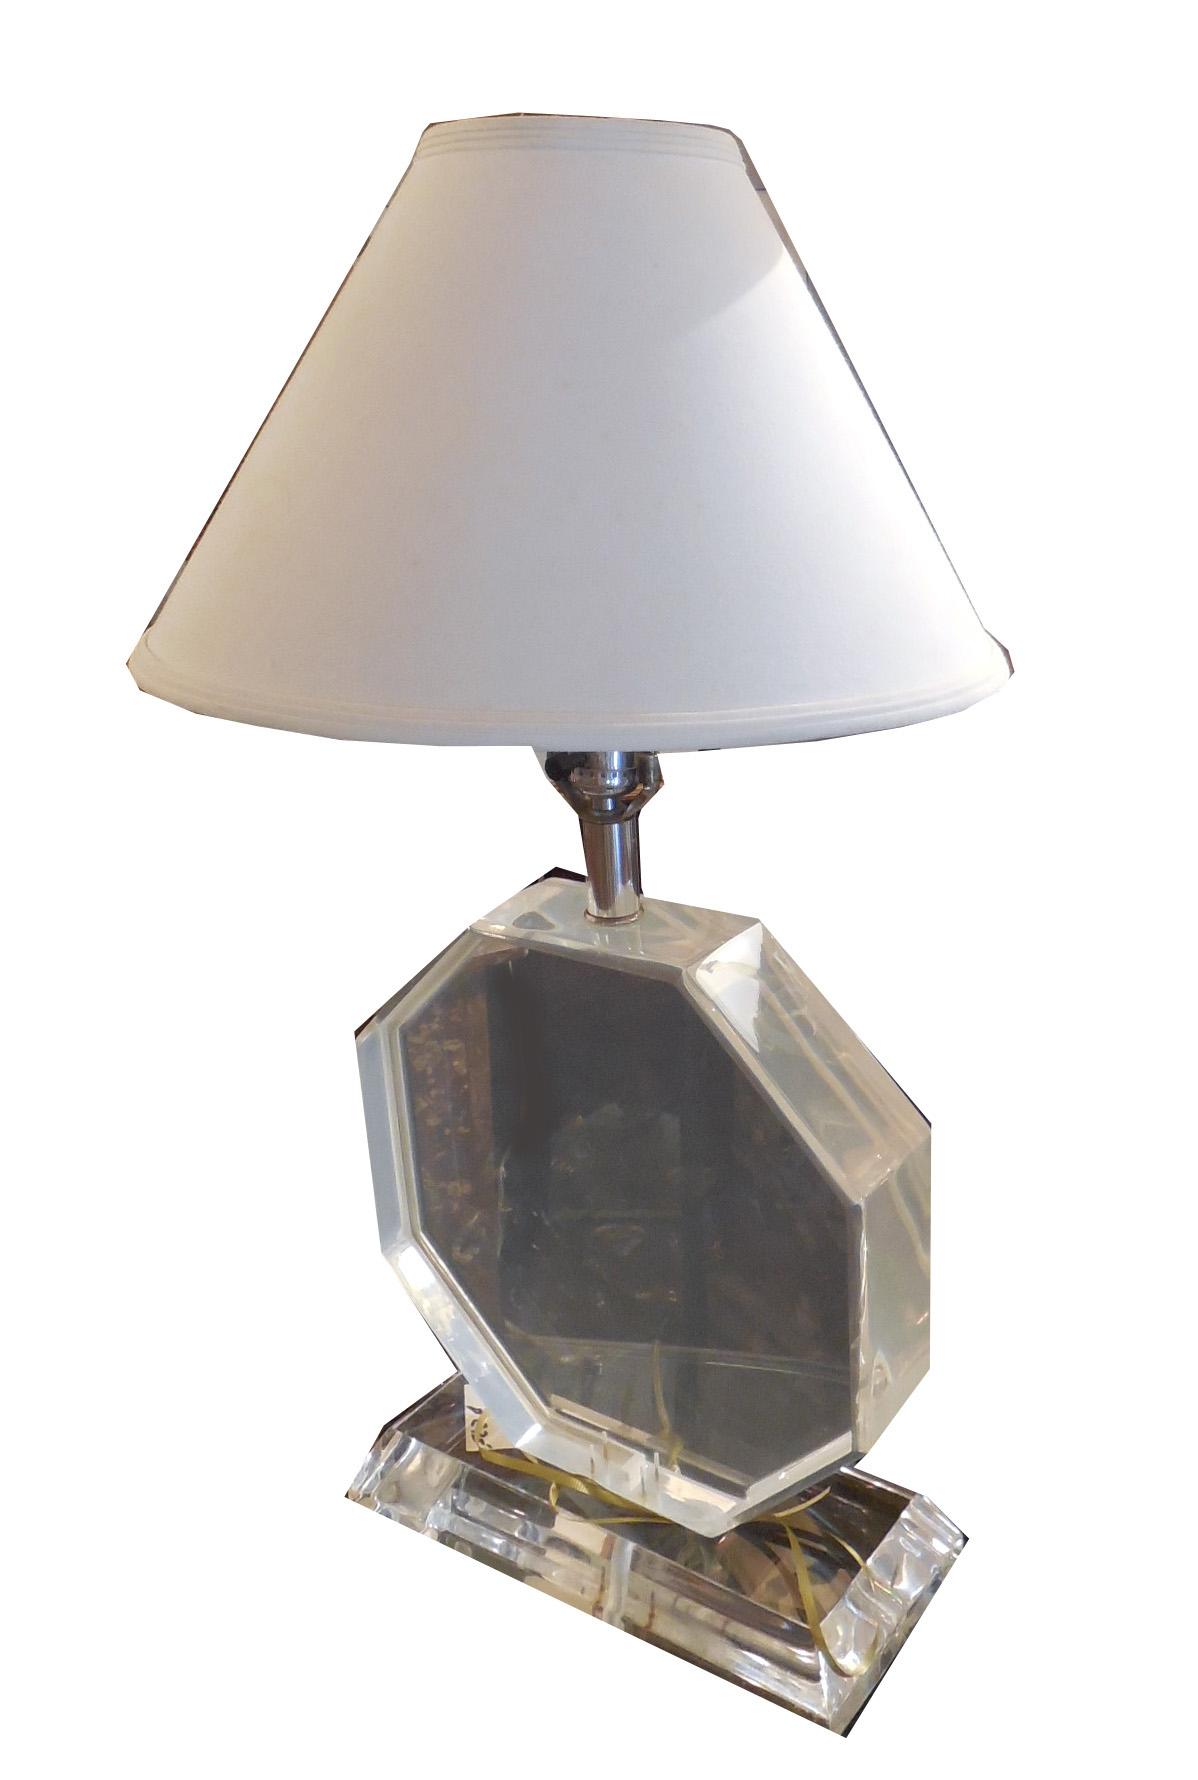 A Modern Geometric Lucite Base Table Lamp Modernism